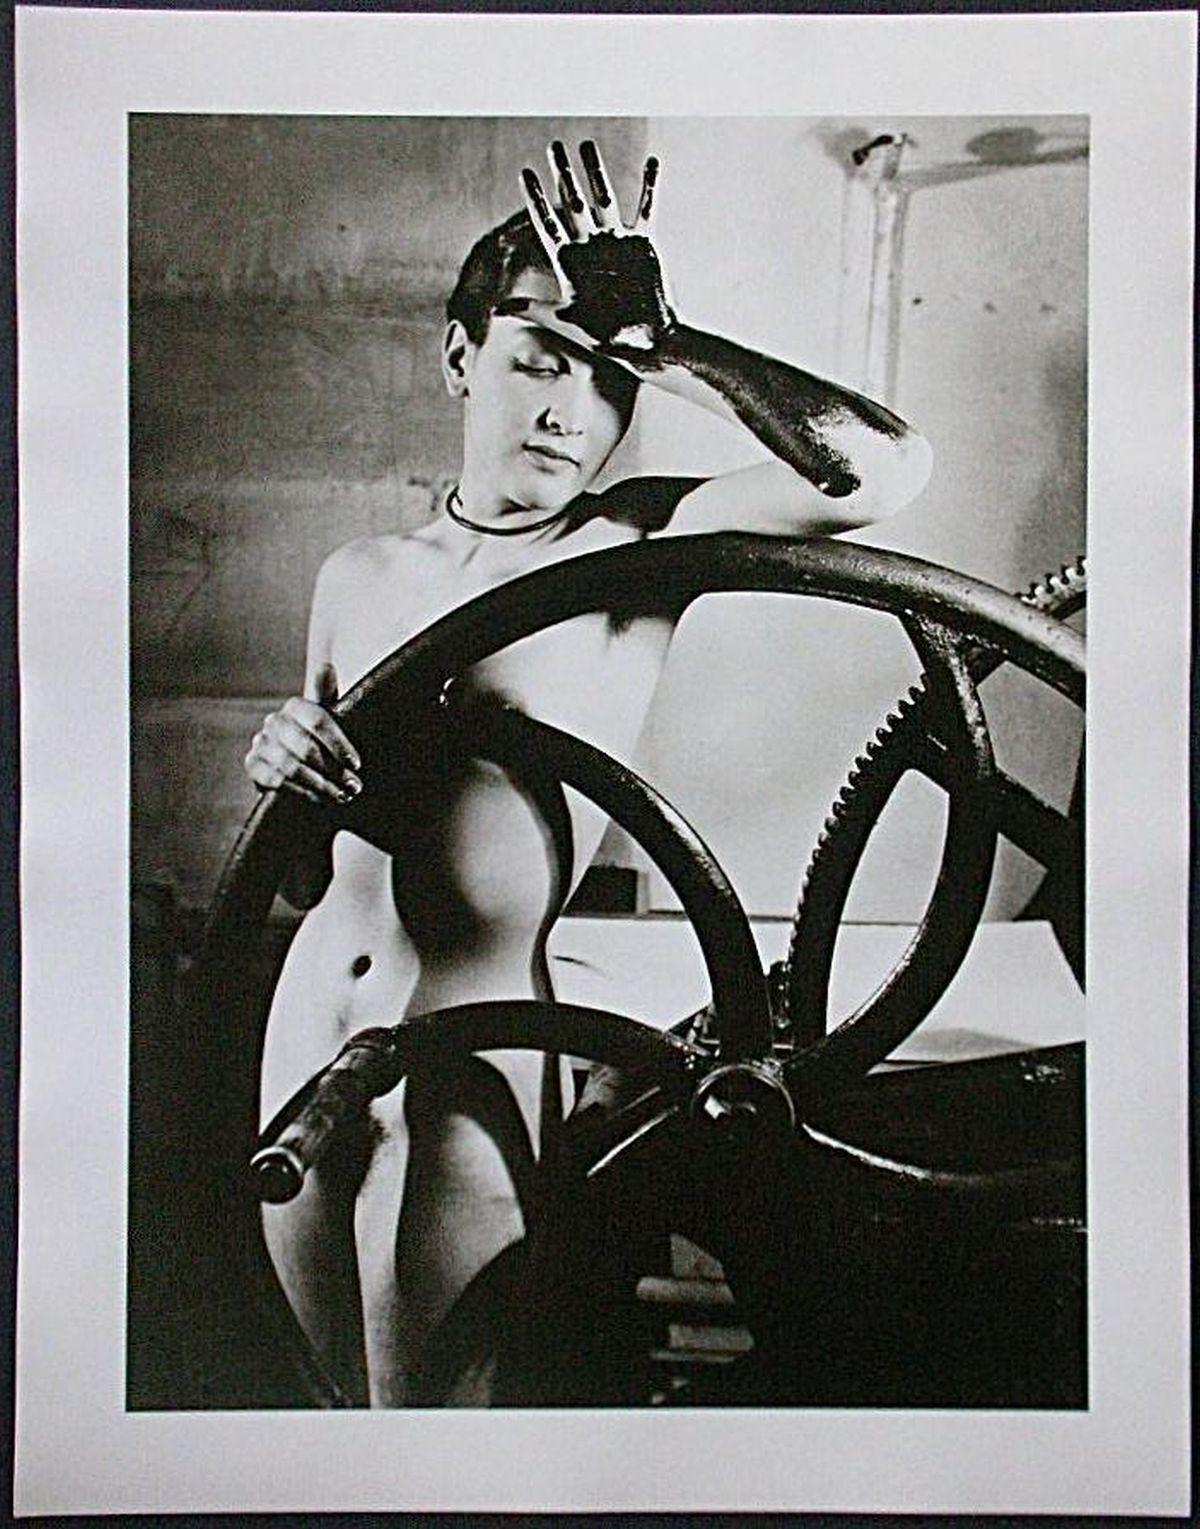 Man Ray - Original Fotografie/Nachlass 1933/91, Erotique voilée, Meret Opppenheim kopen? Bied vanaf 1100!